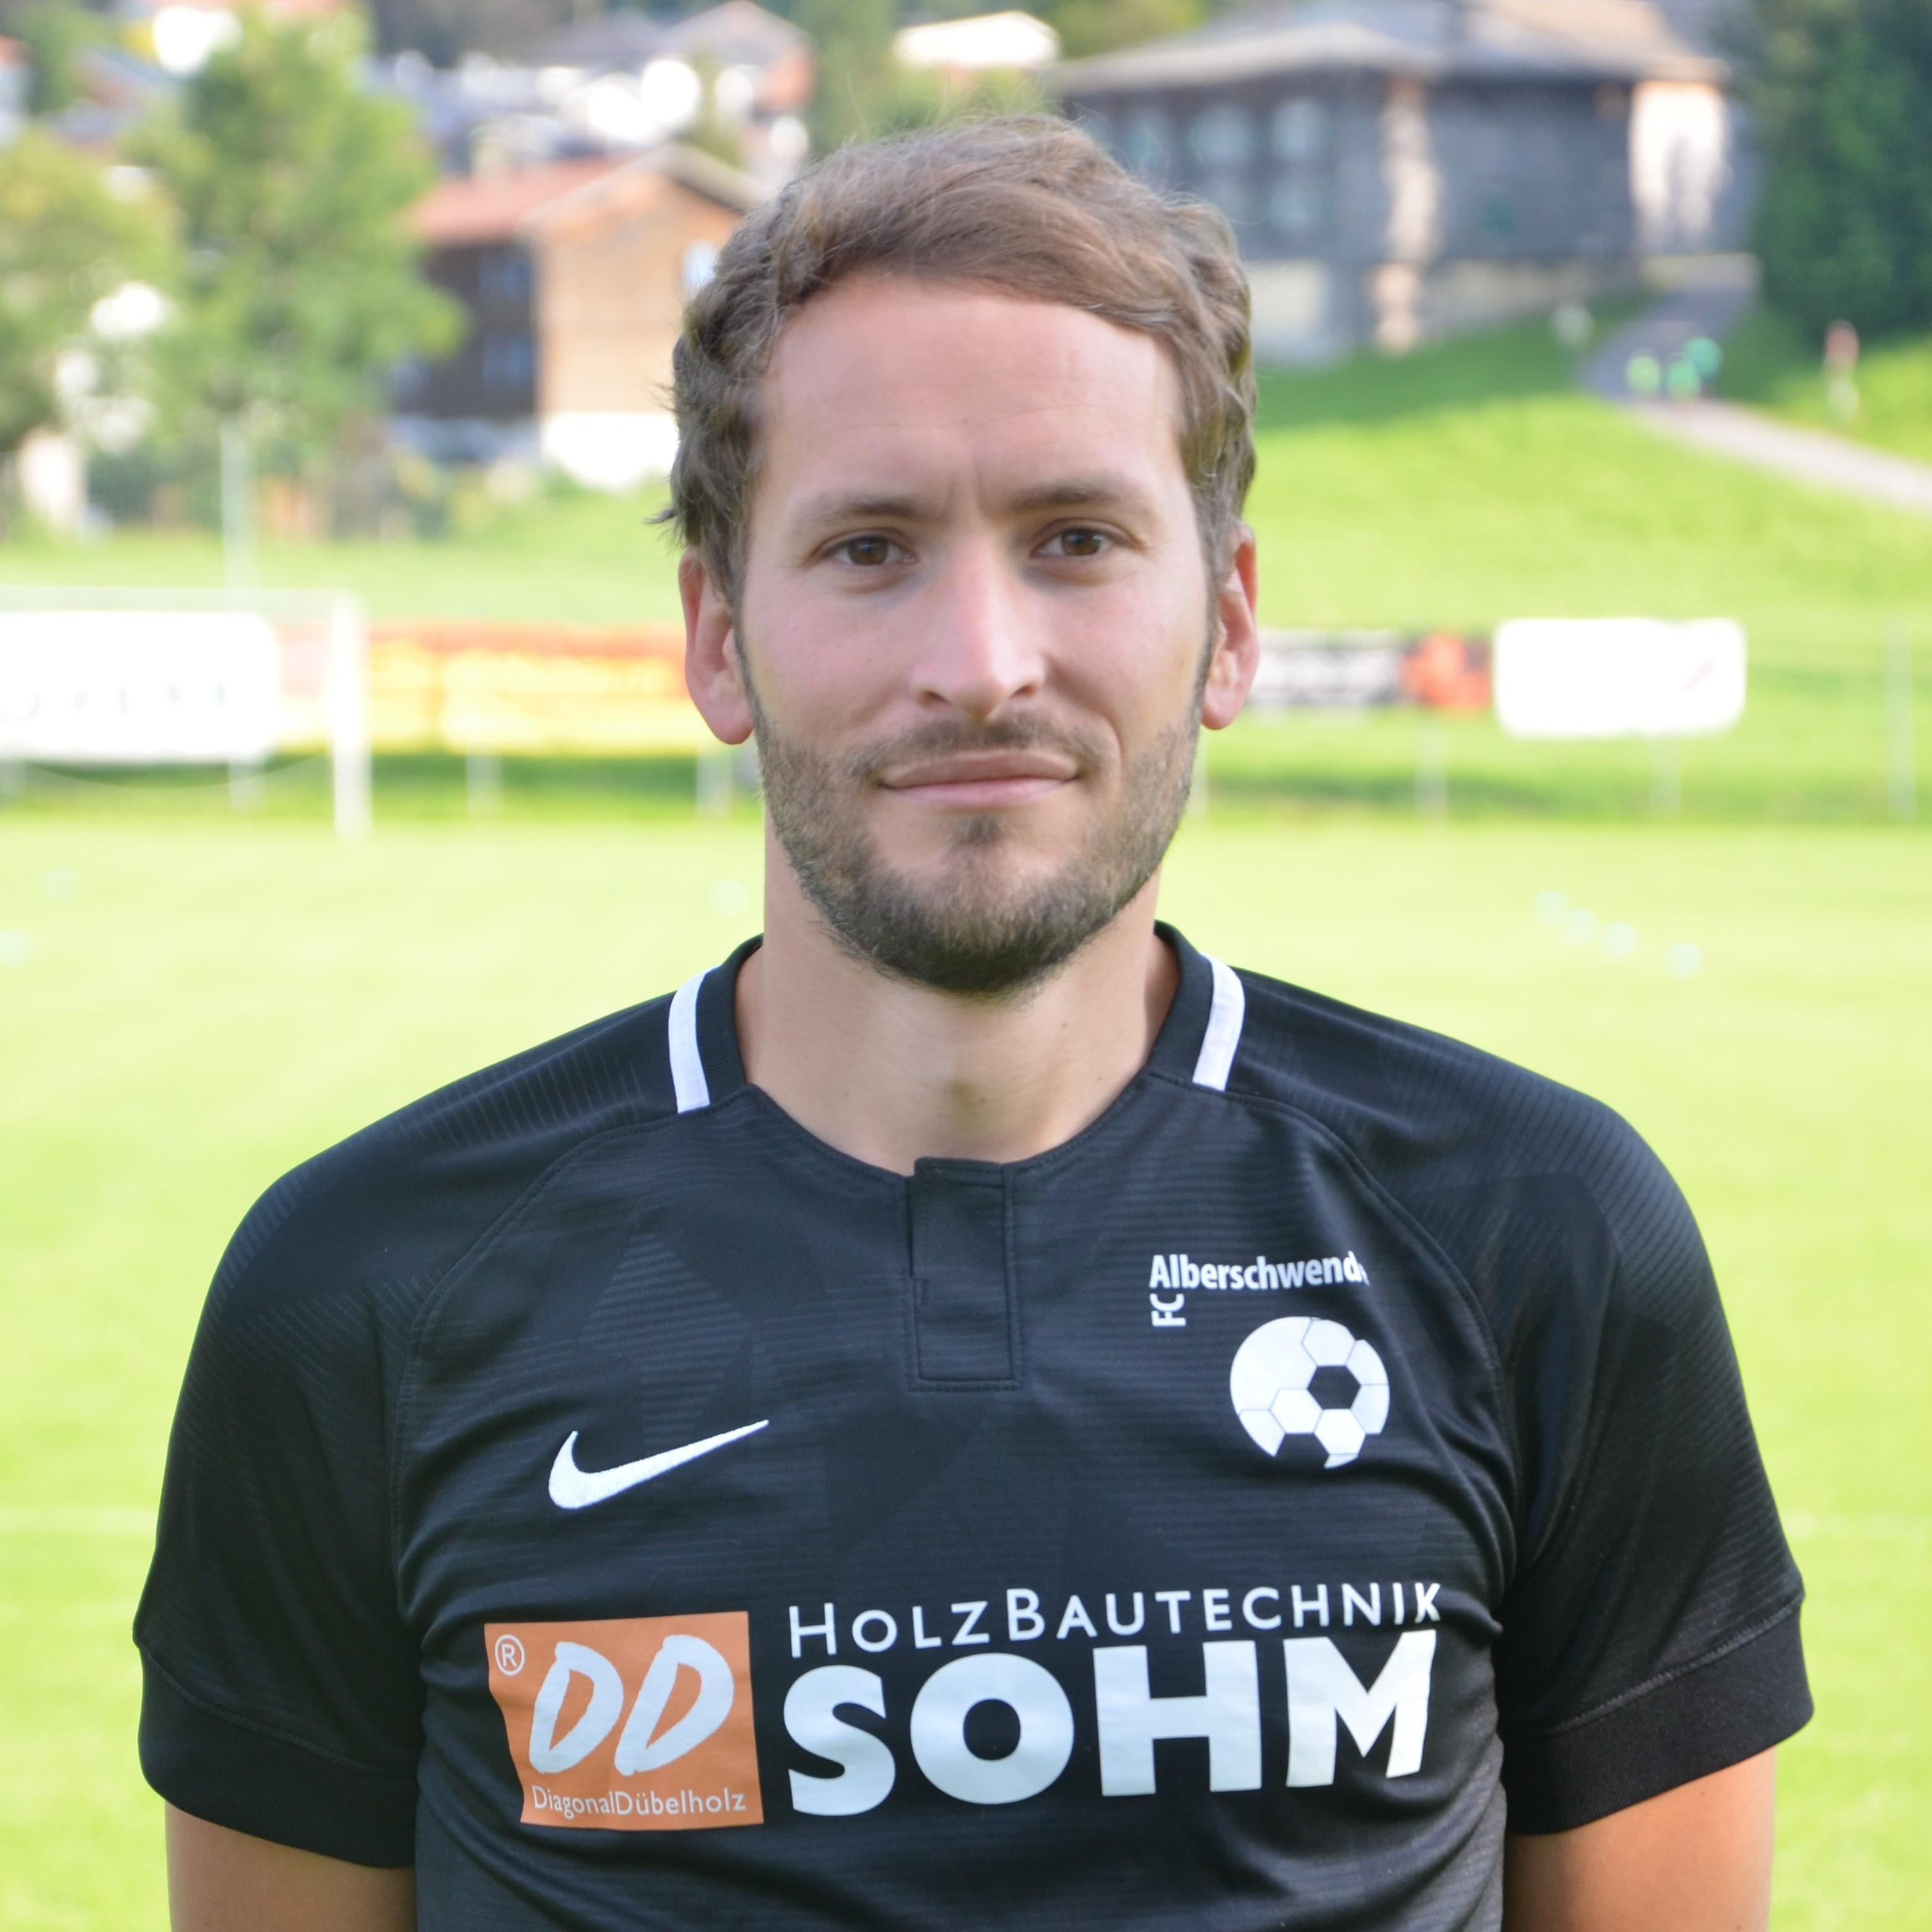 Christoph Sohm